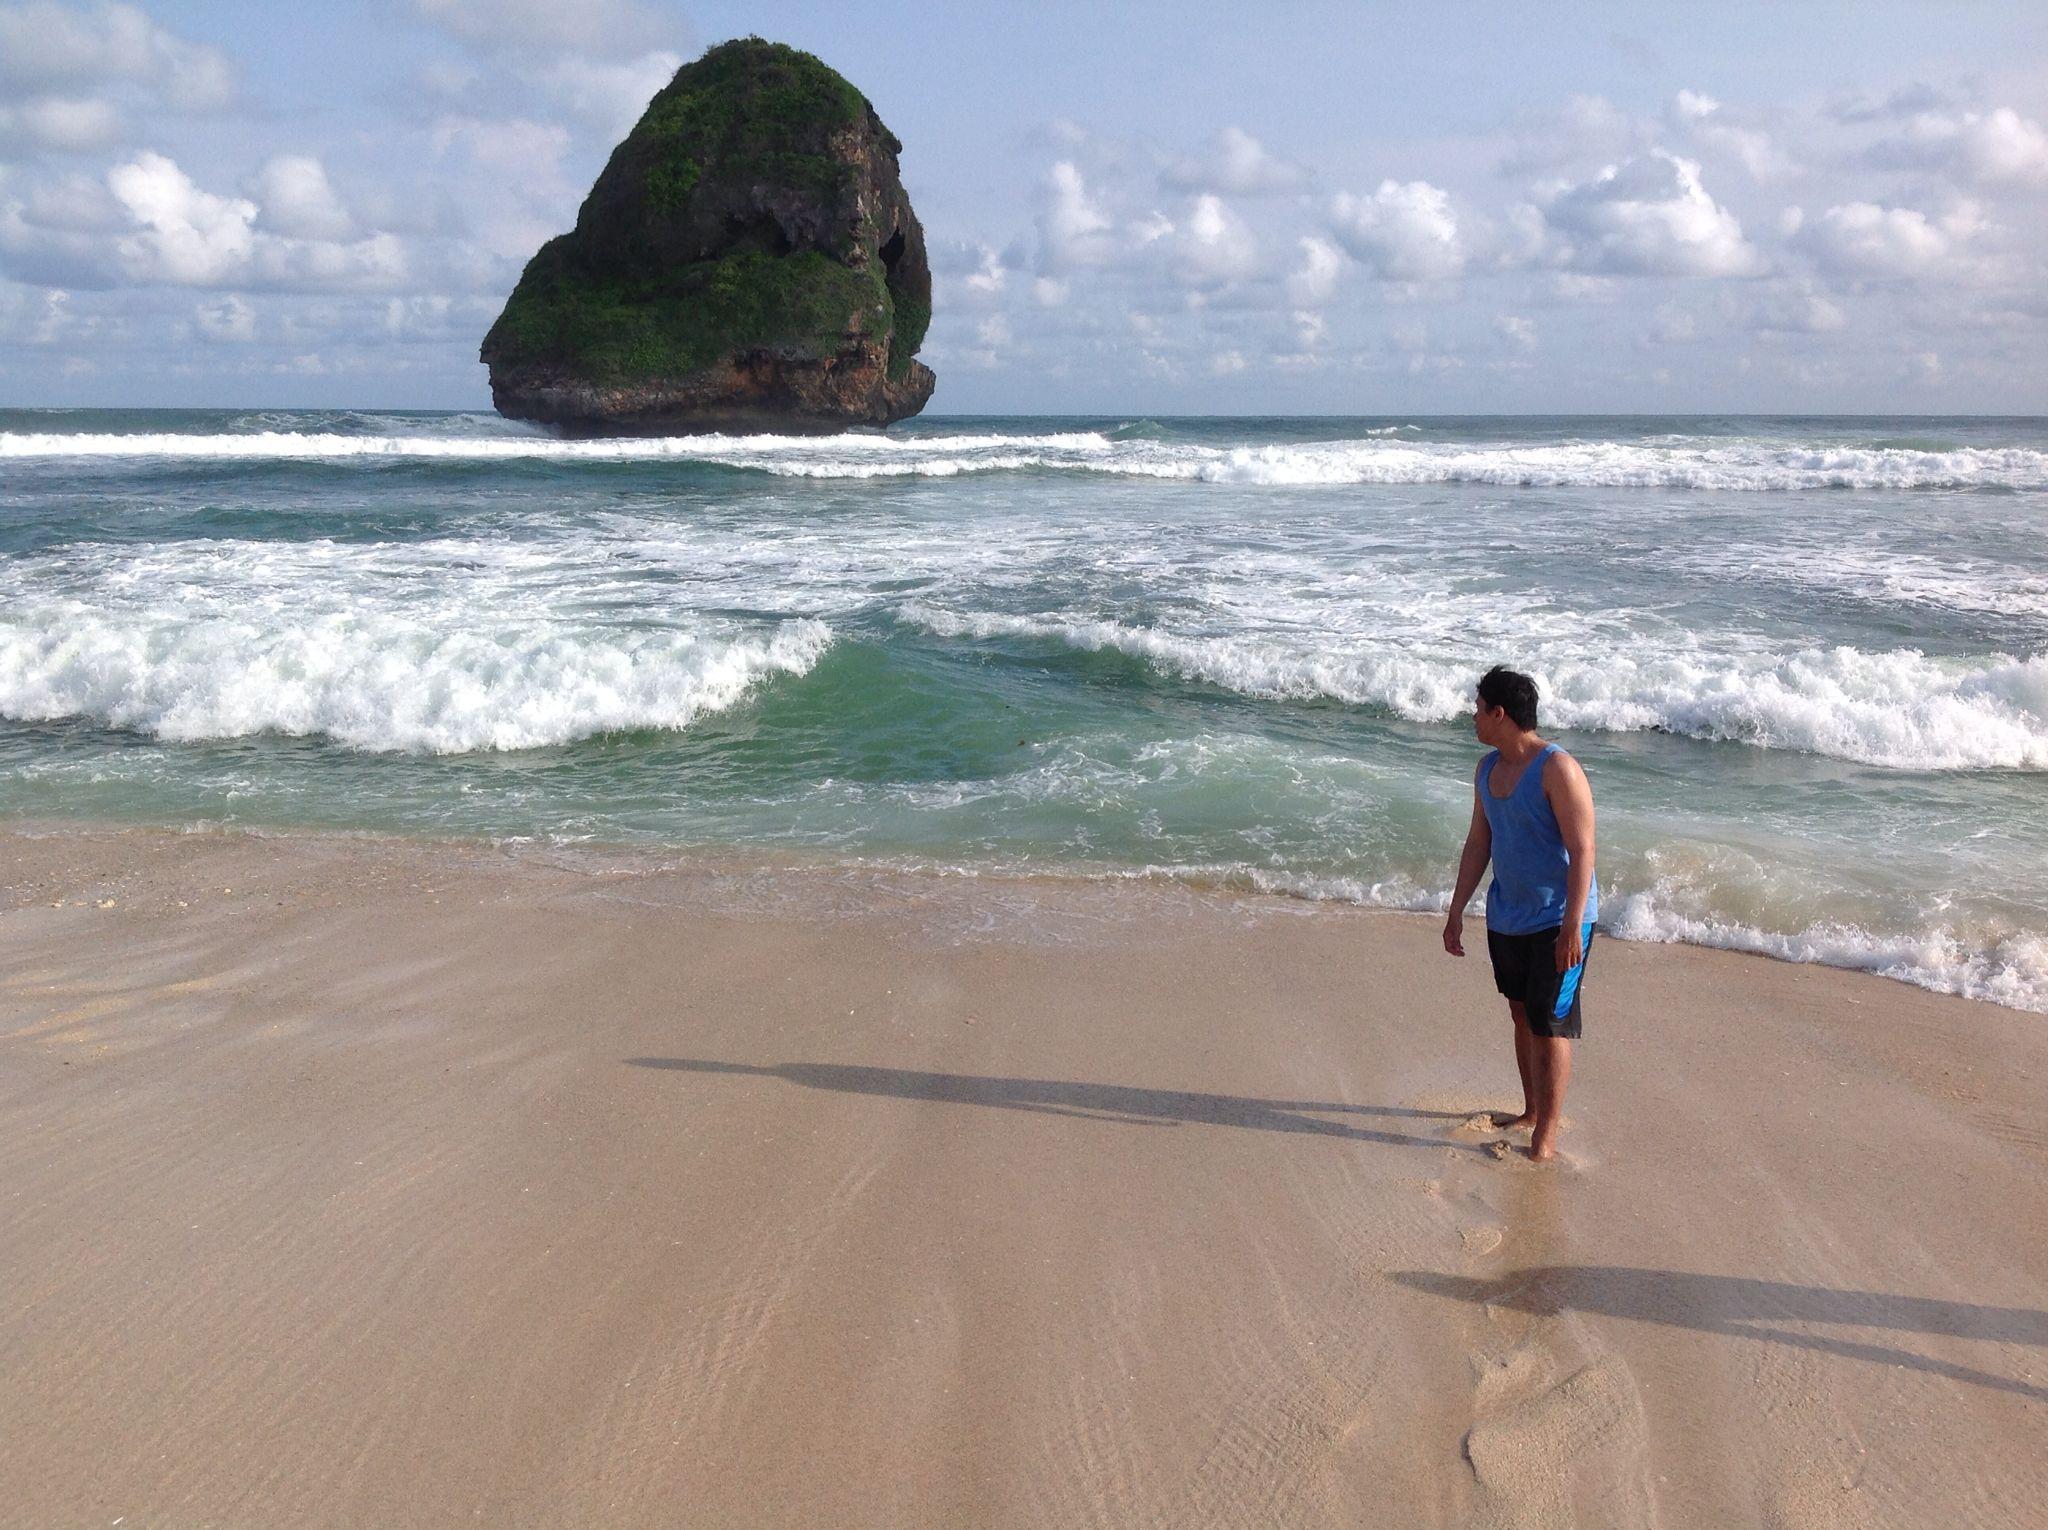 Chinese Cave Beach Pantai Goa Cina Malang Indonesia Waves Sand